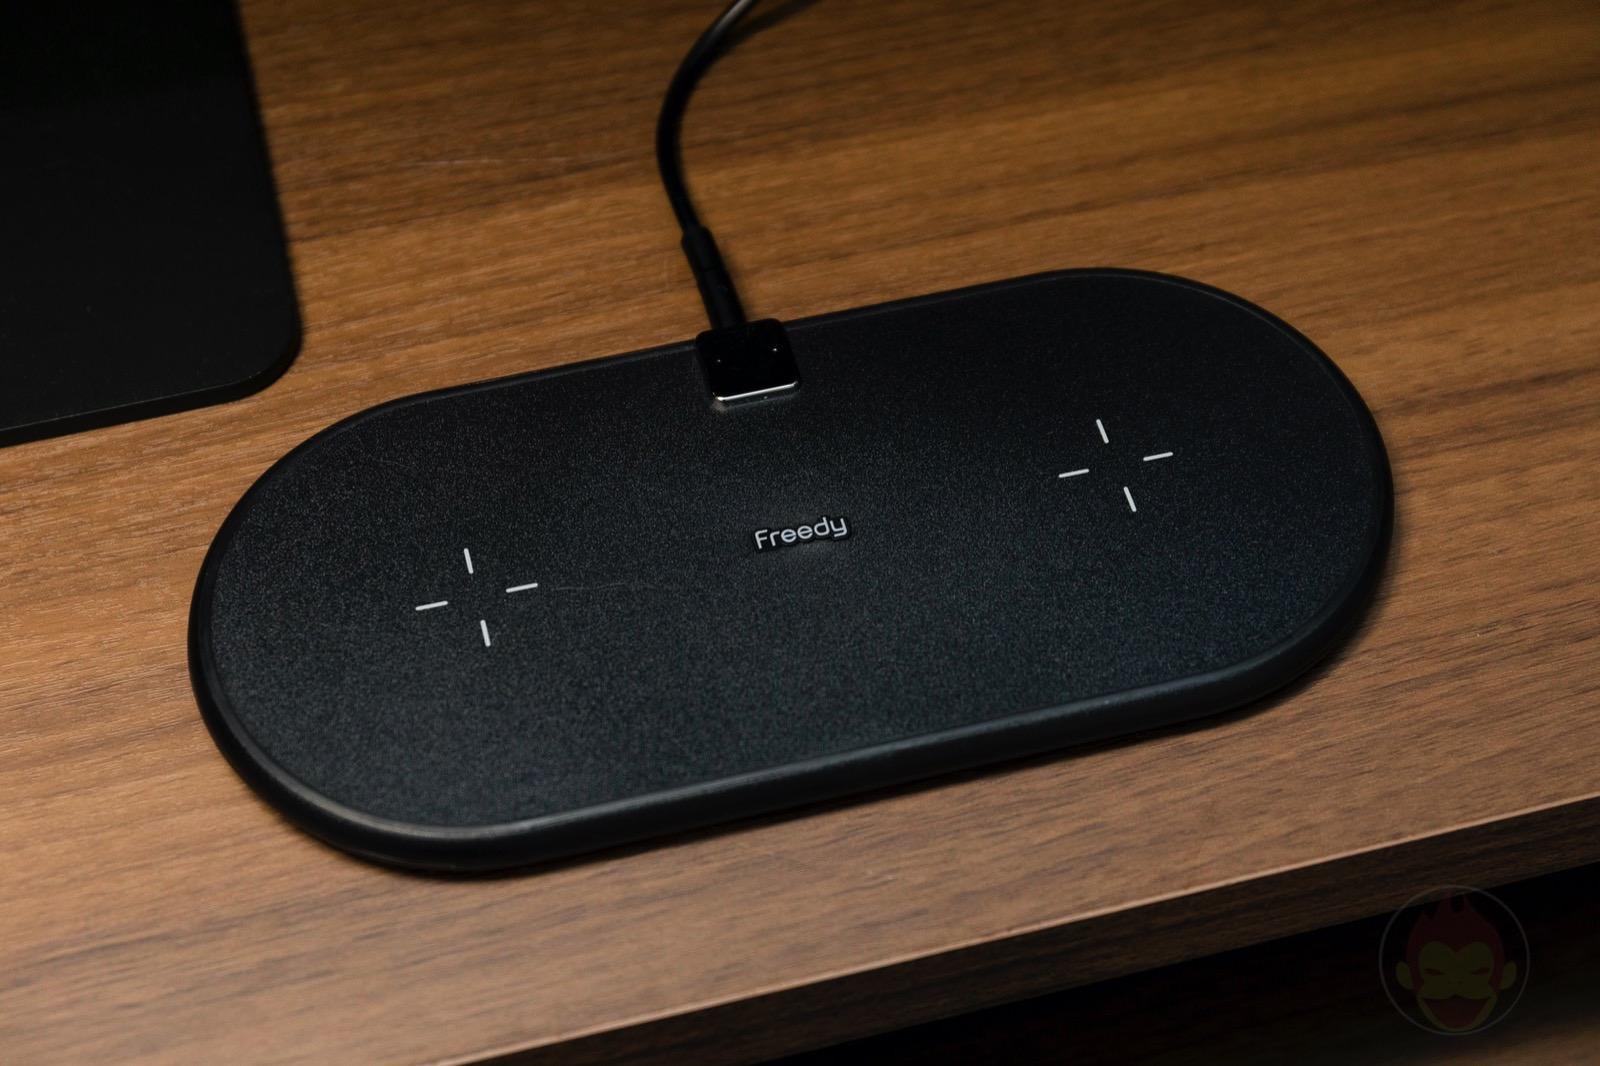 Freedy-Qi-Flex-Dual-Wireless-pad-03.jpg